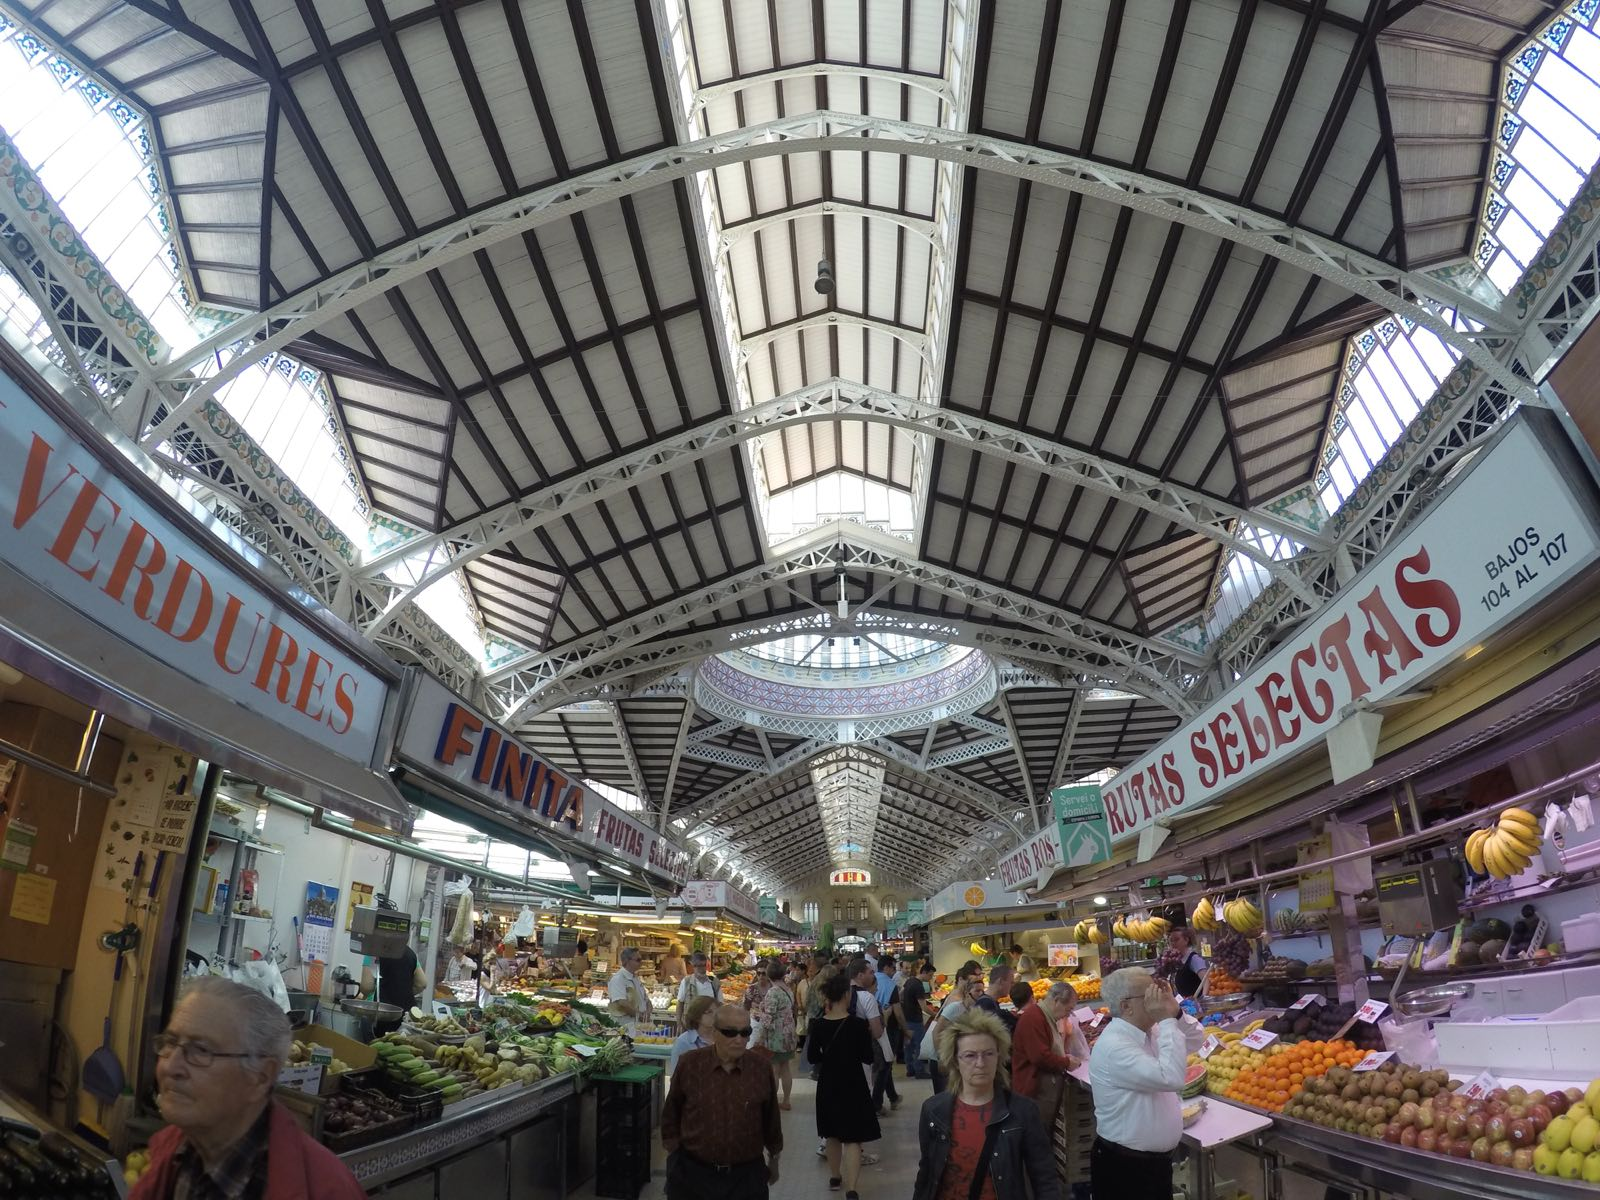 valencia worth visiting - Mercado Central de Valencia